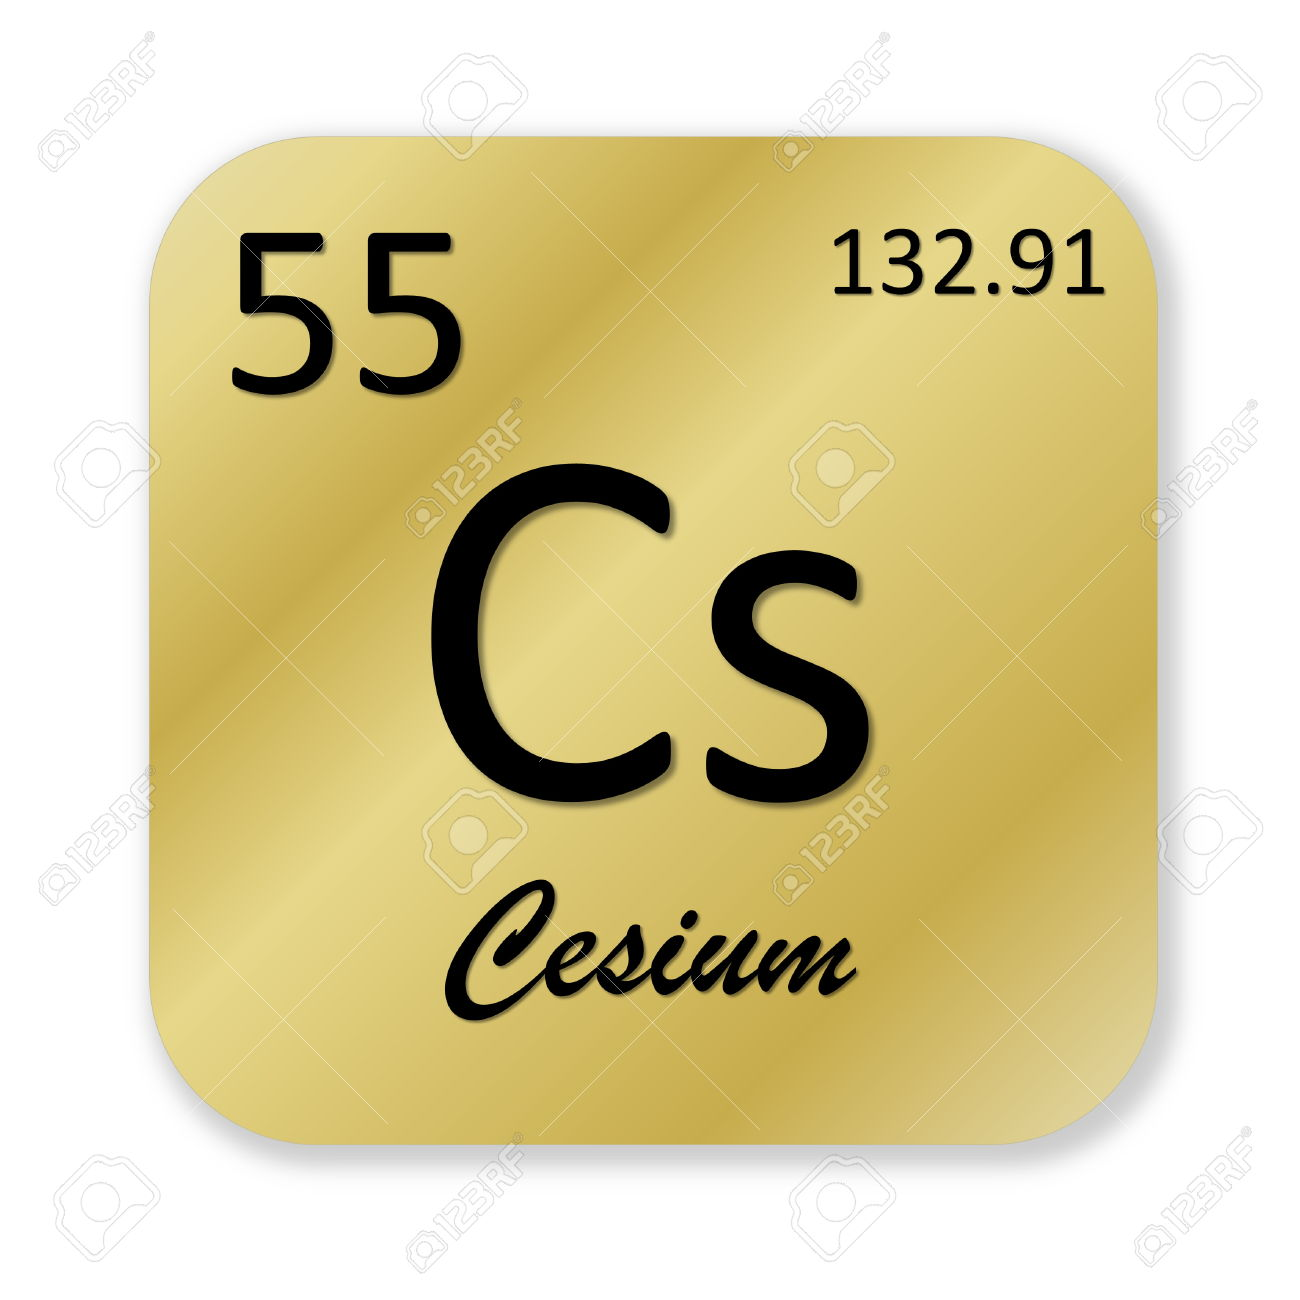 Caesium clipart #6, Download drawings